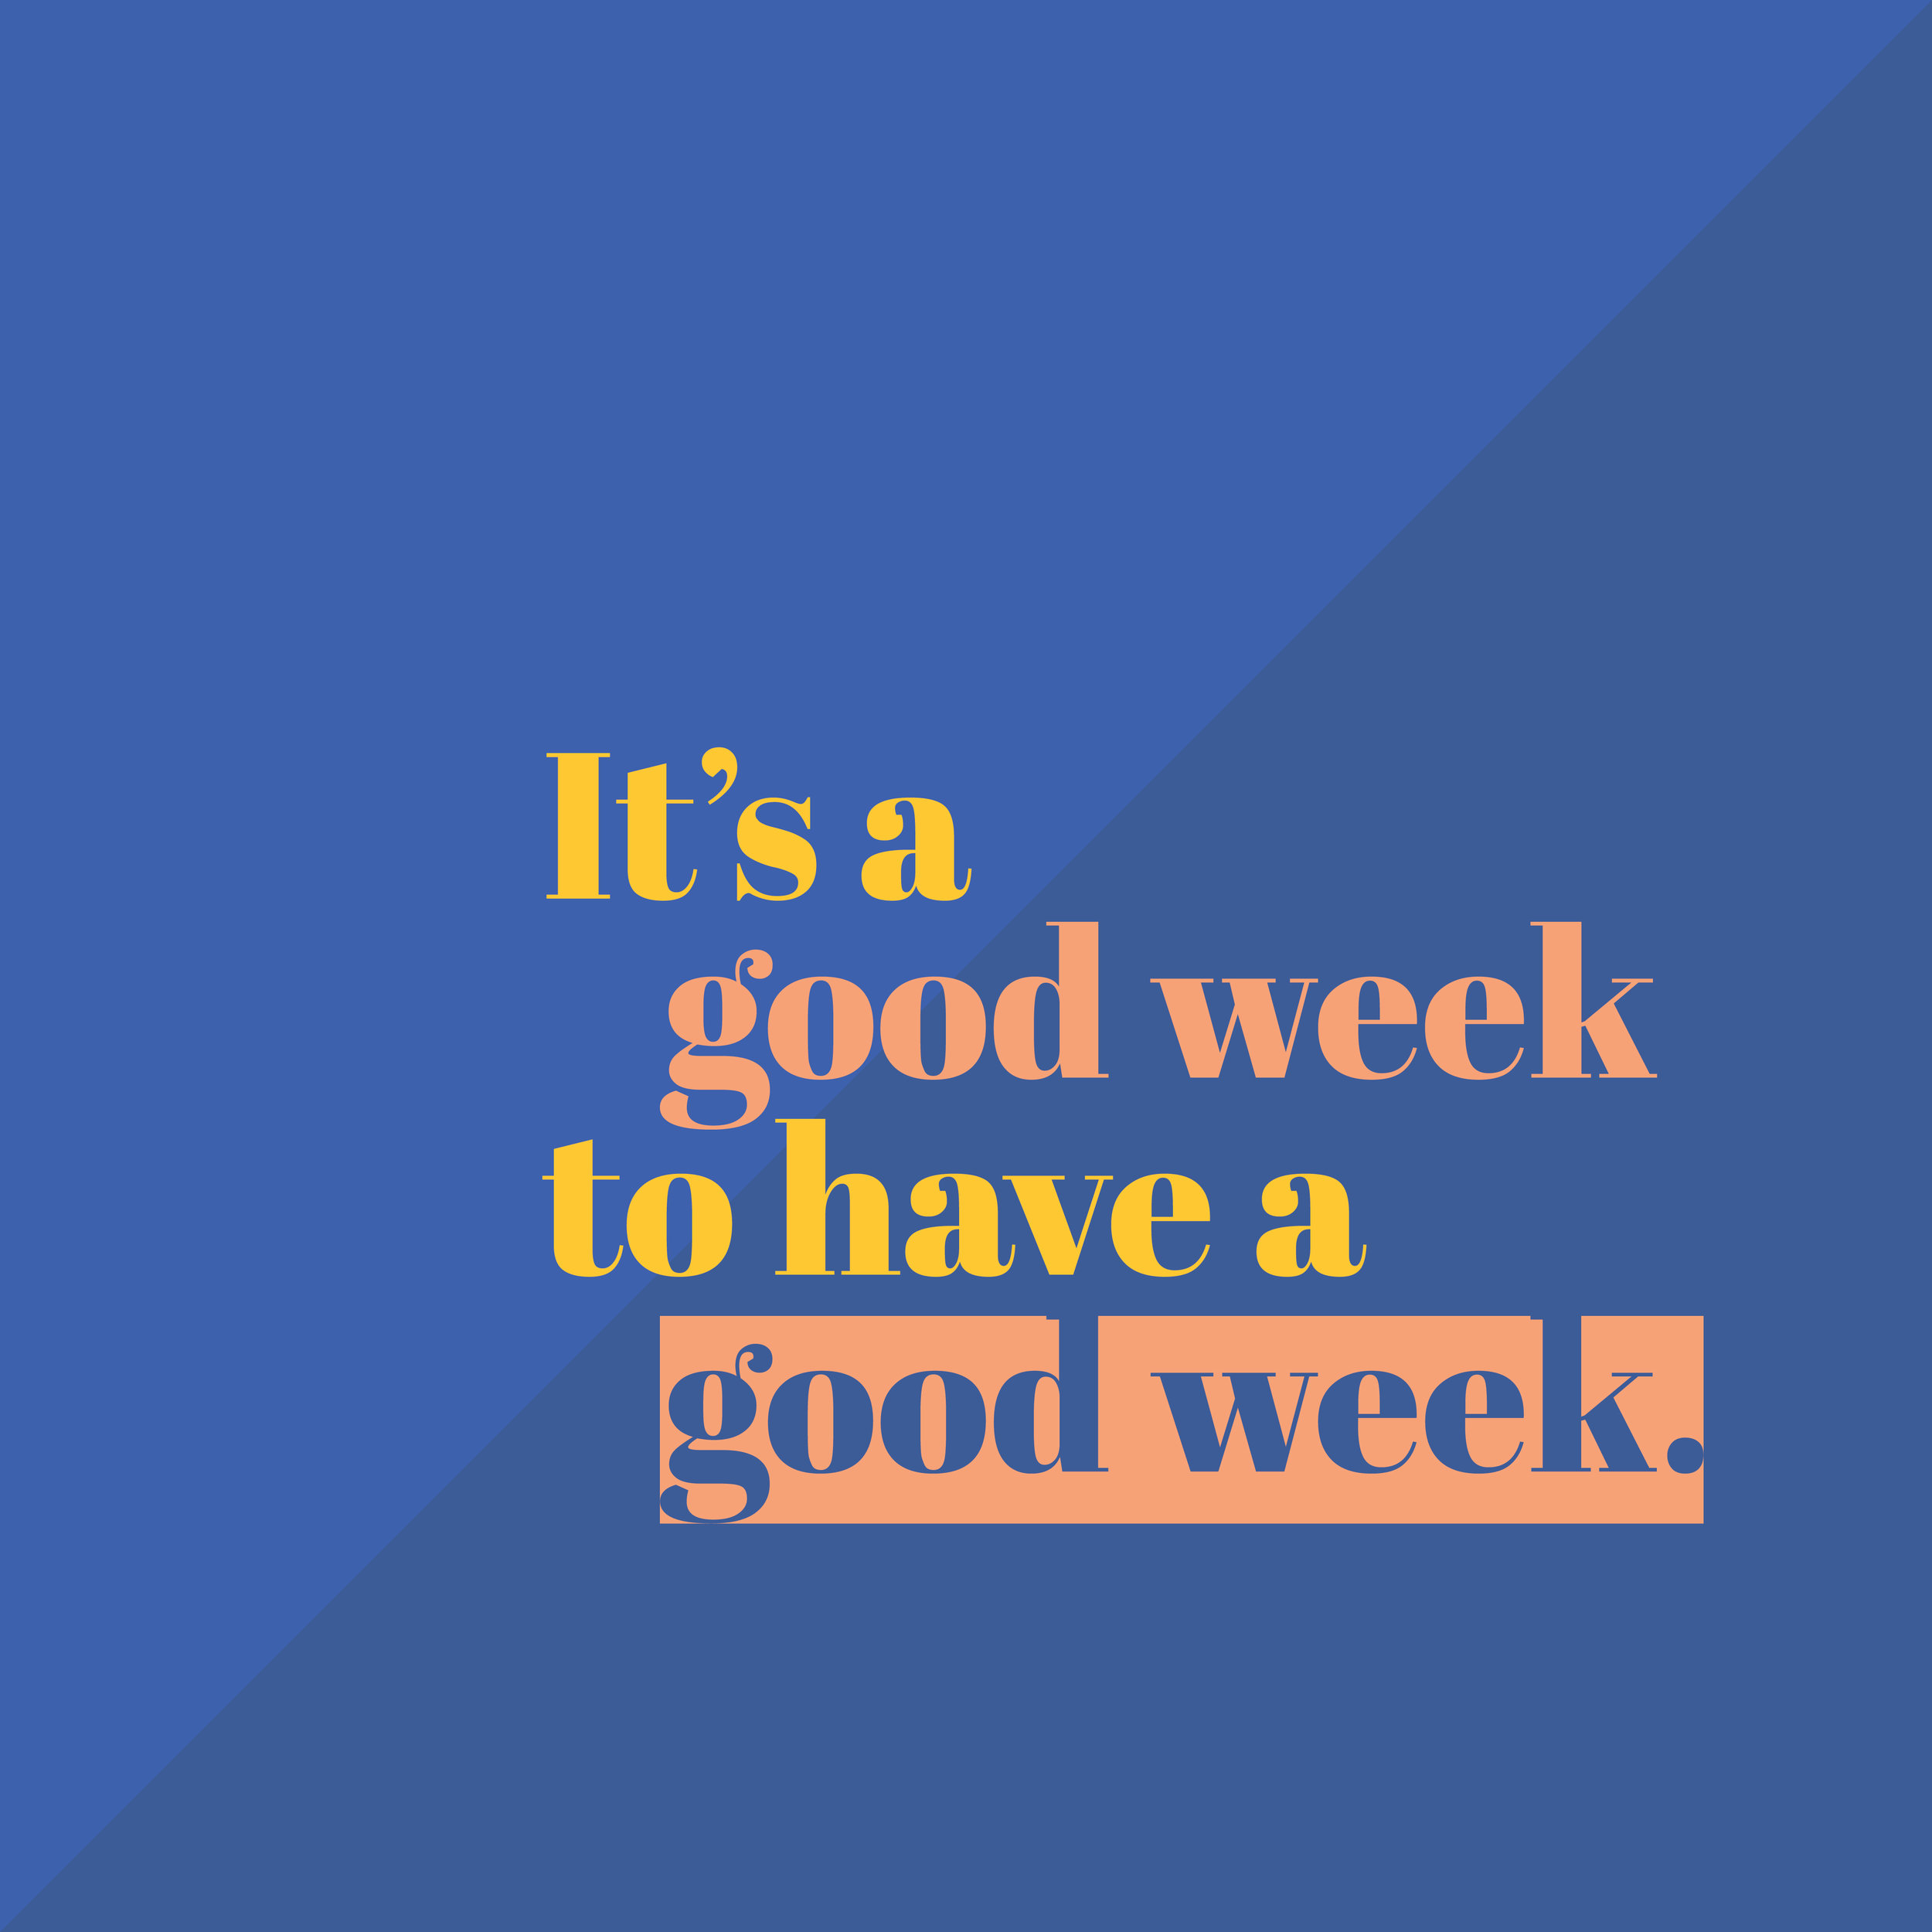 its a good week to have a good week.jpg